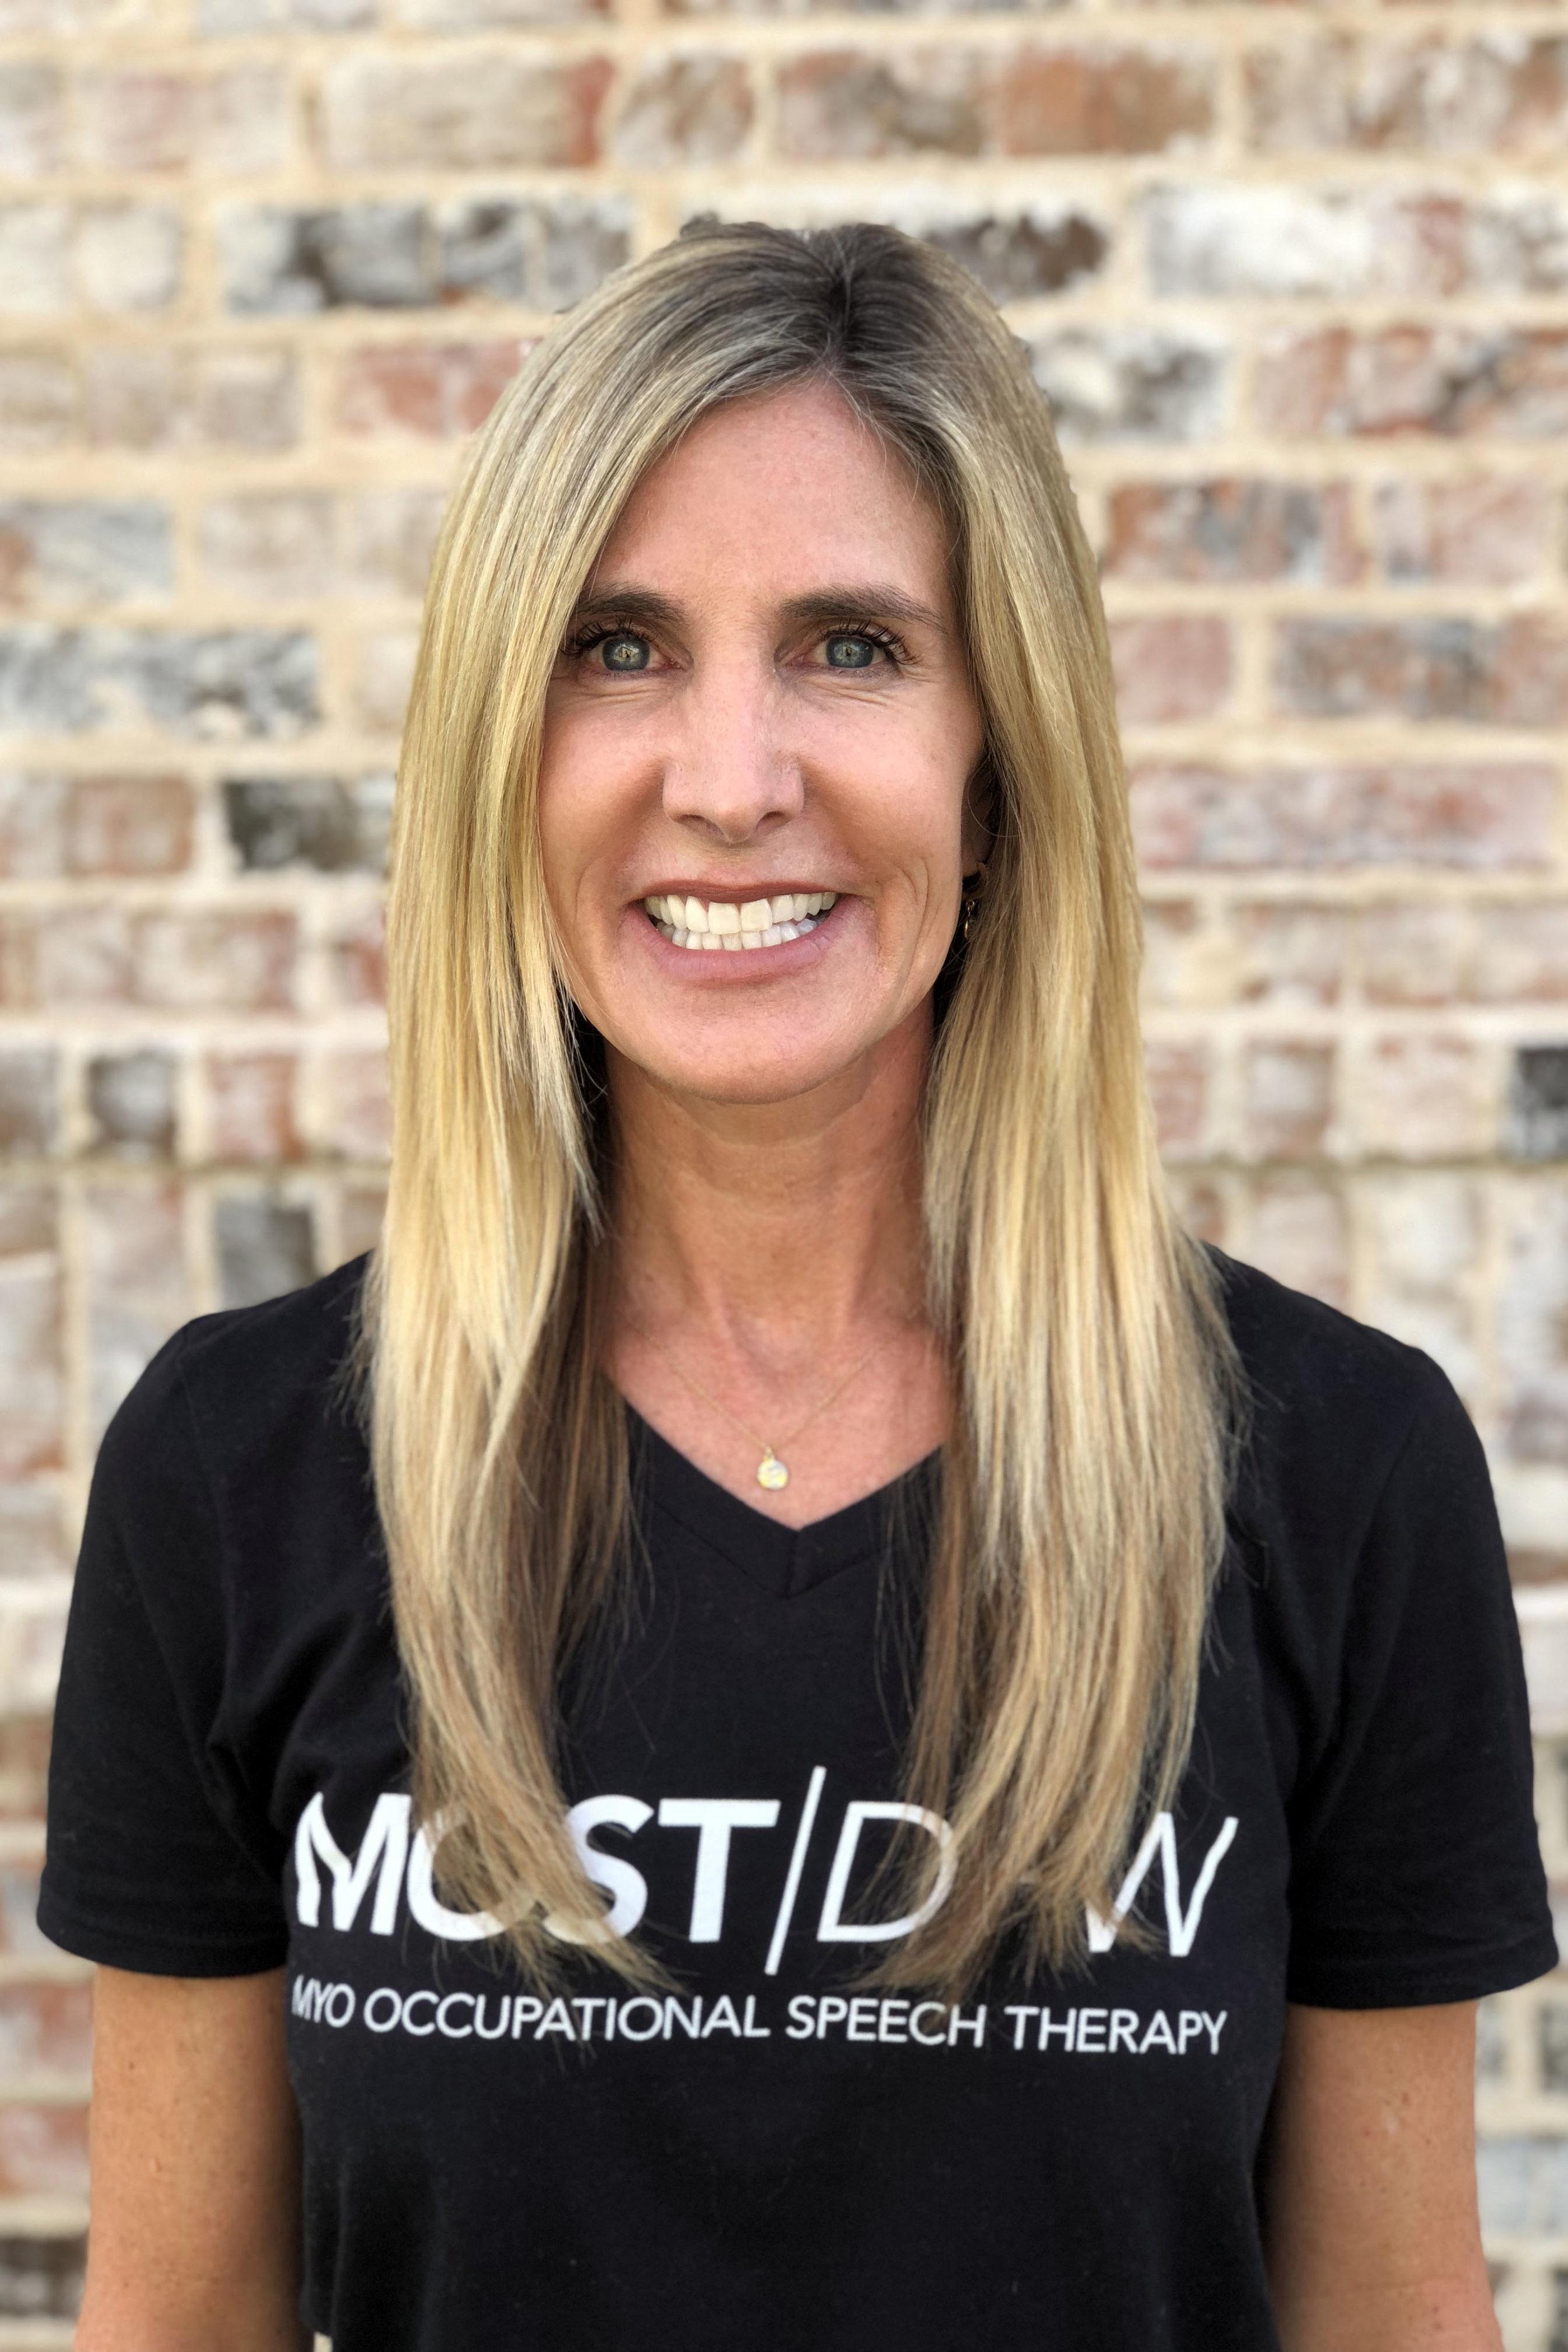 Shannon Smith, MS/CCC-SLP    shannons@mostdfw.com